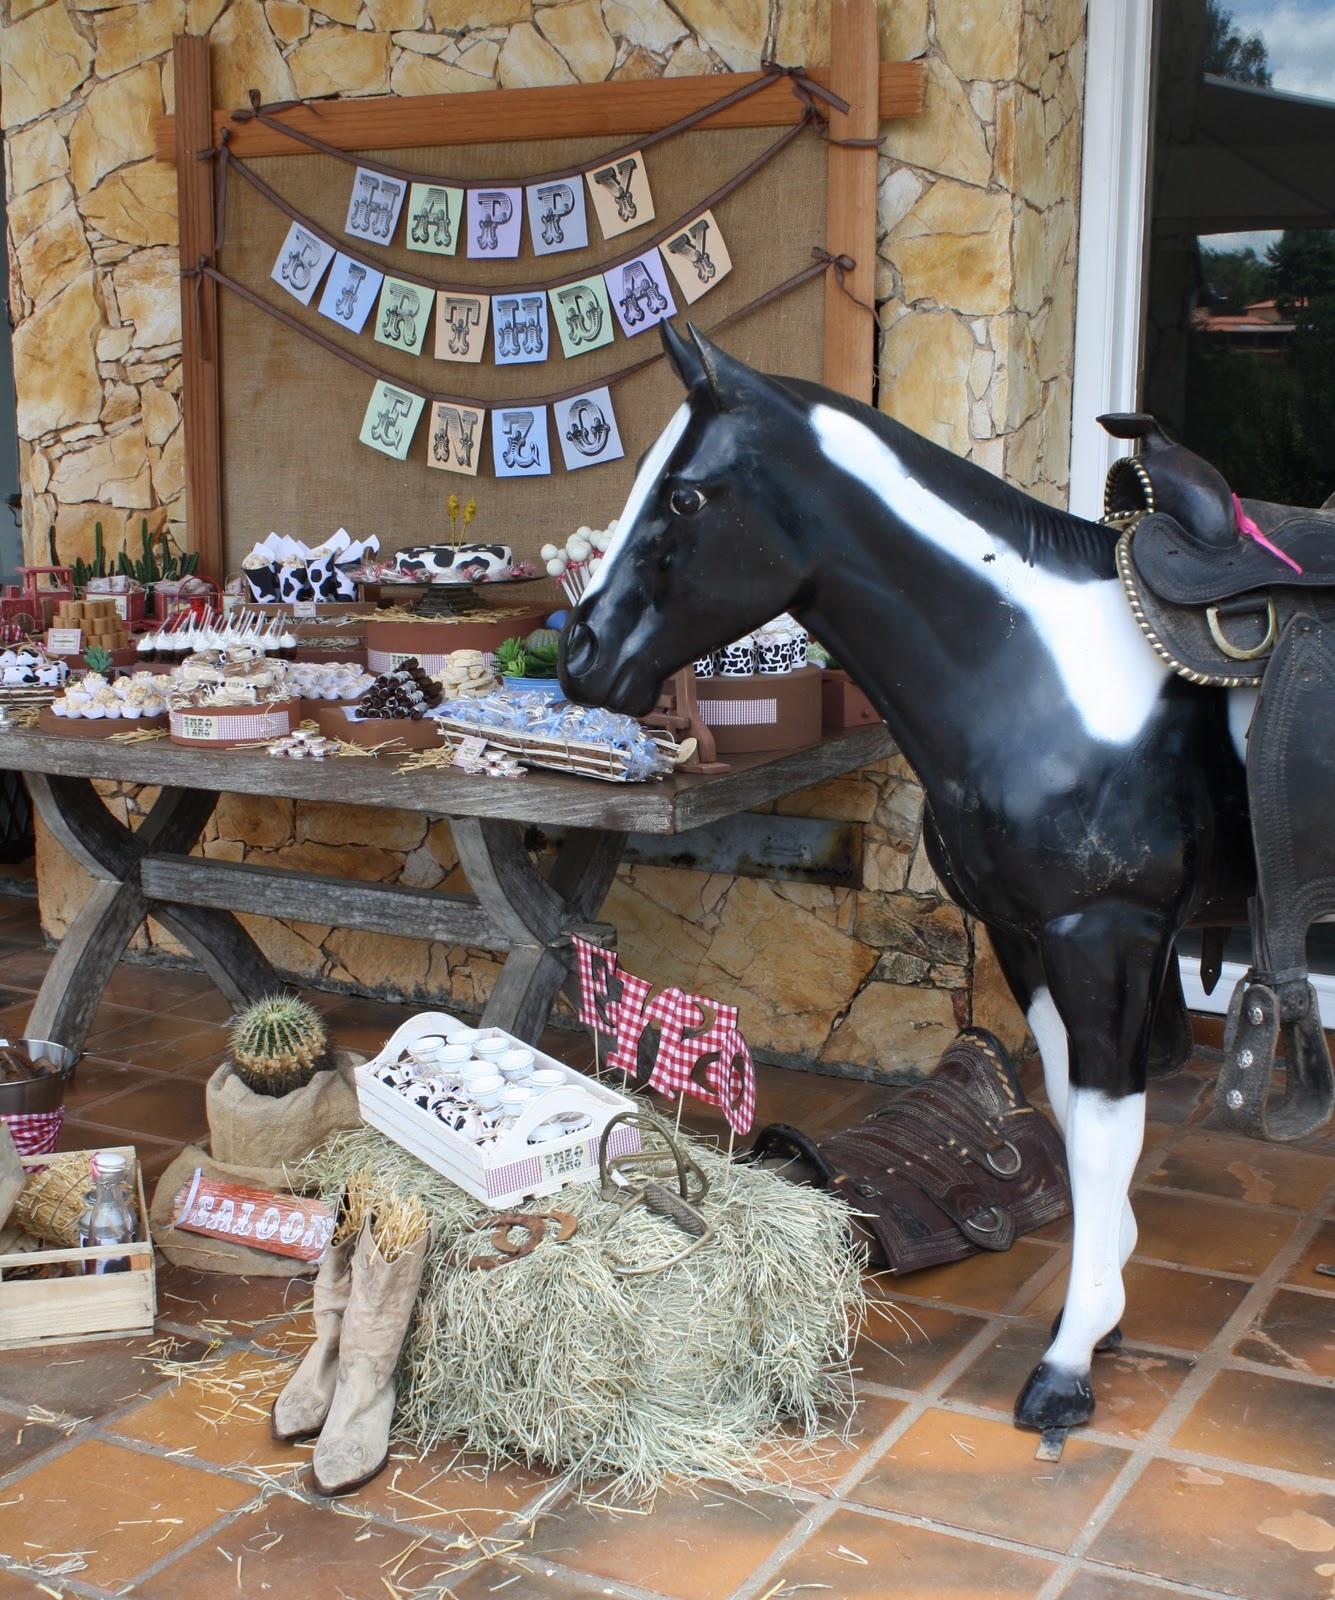 Western Decor For Birthday: Dulce Design: Cowboy Party